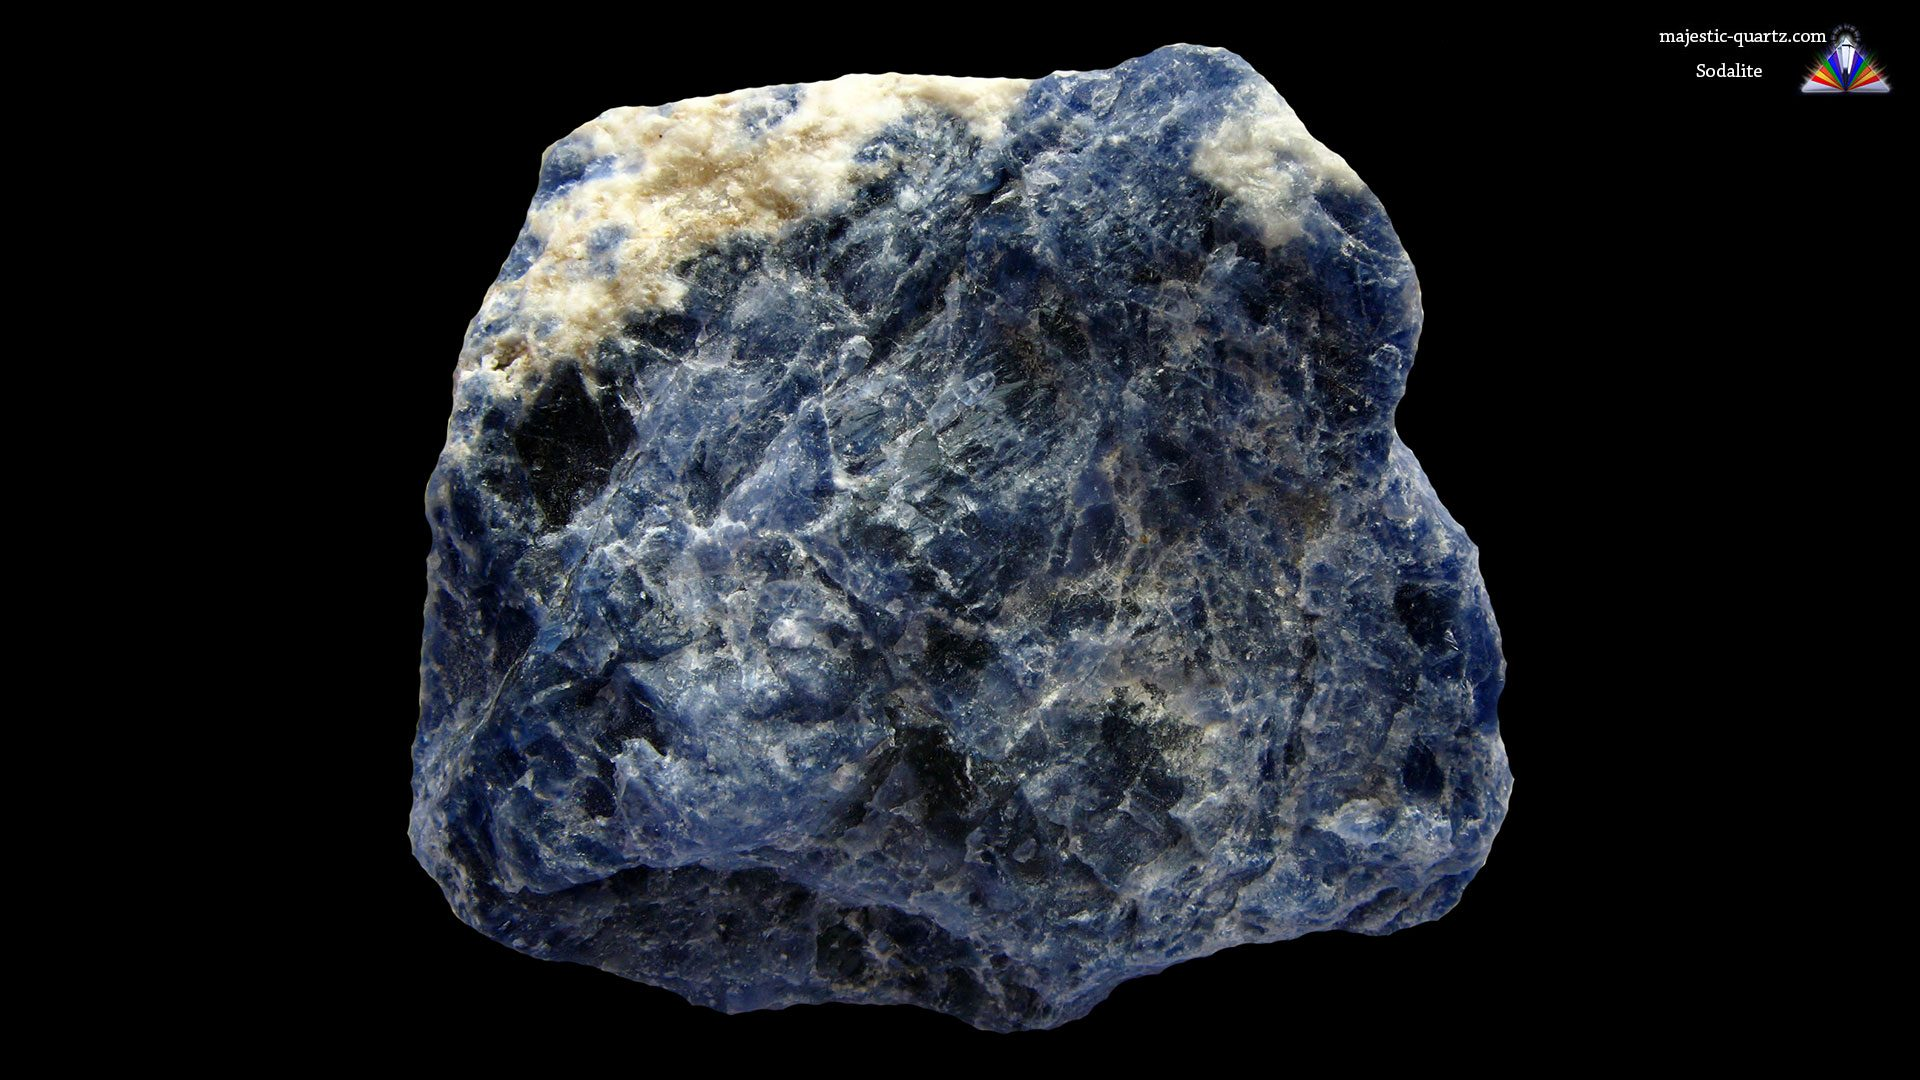 Sodalite massive/rough Specimen - Mineral Specimen